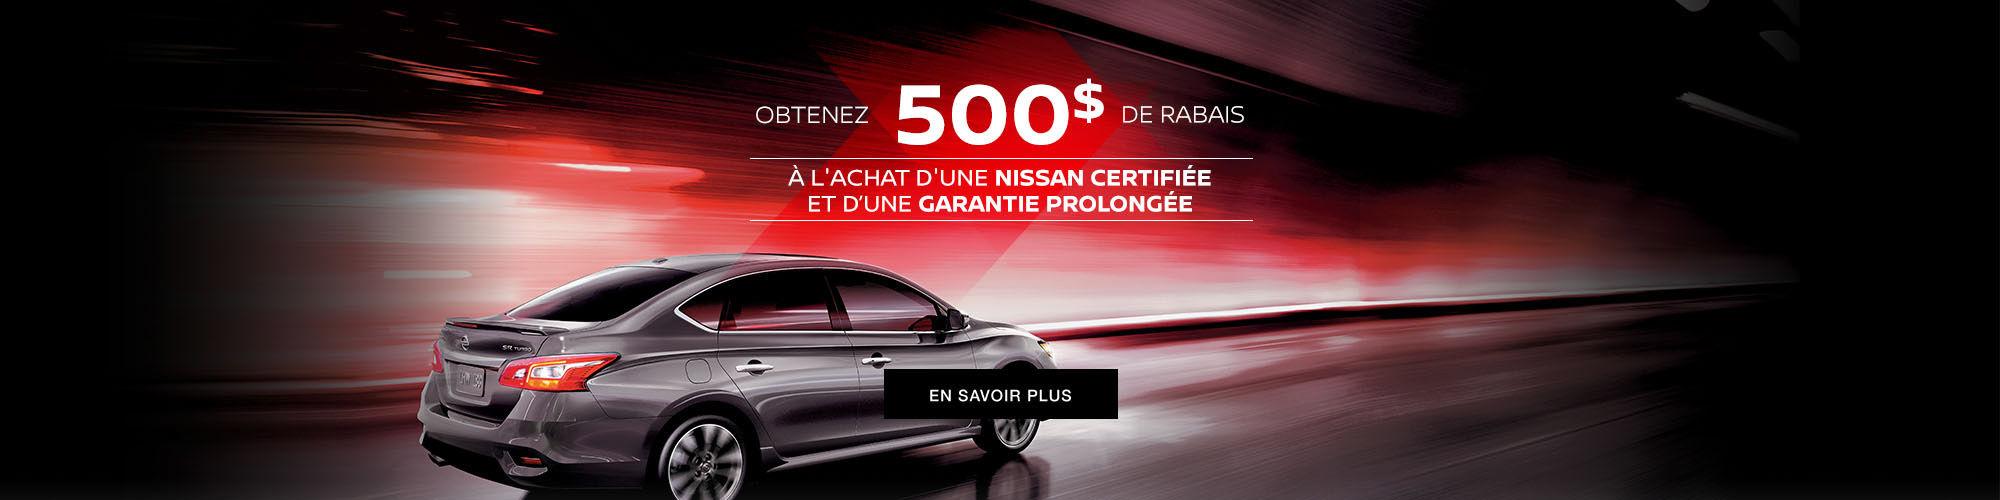 Promo Occasion certifié Nissan